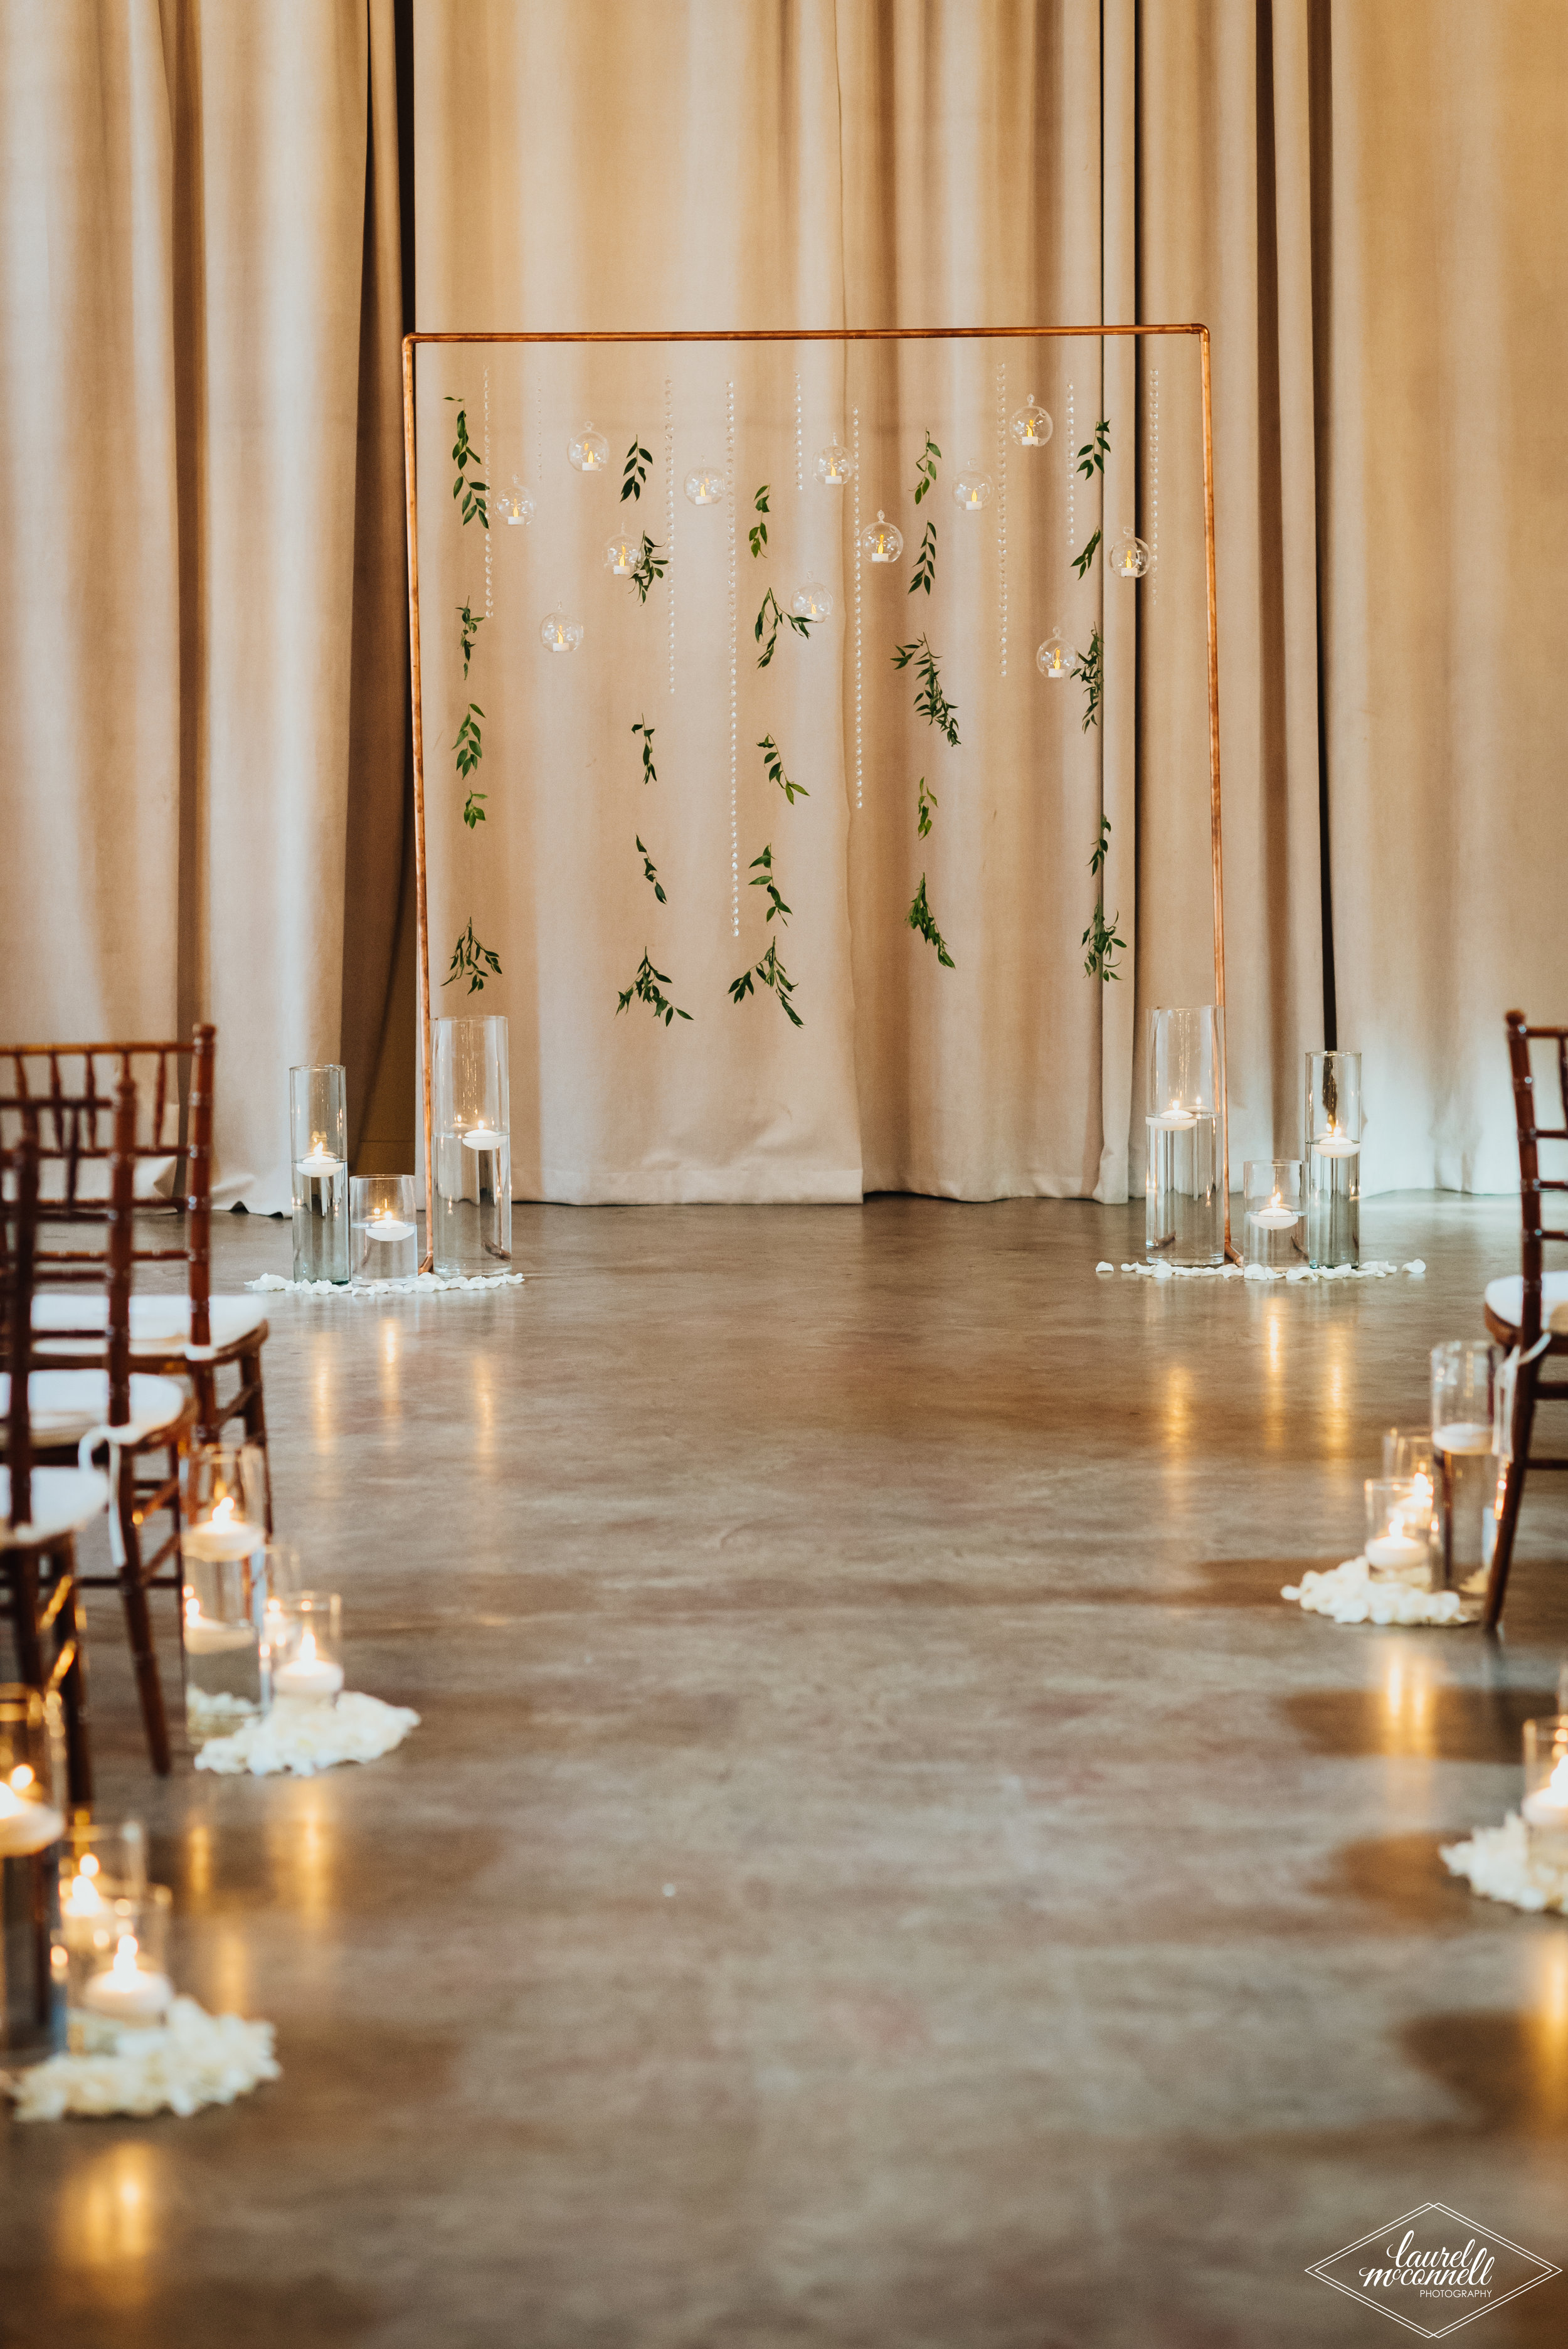 Pantone Wedding Ceremony Backdrop Inspo